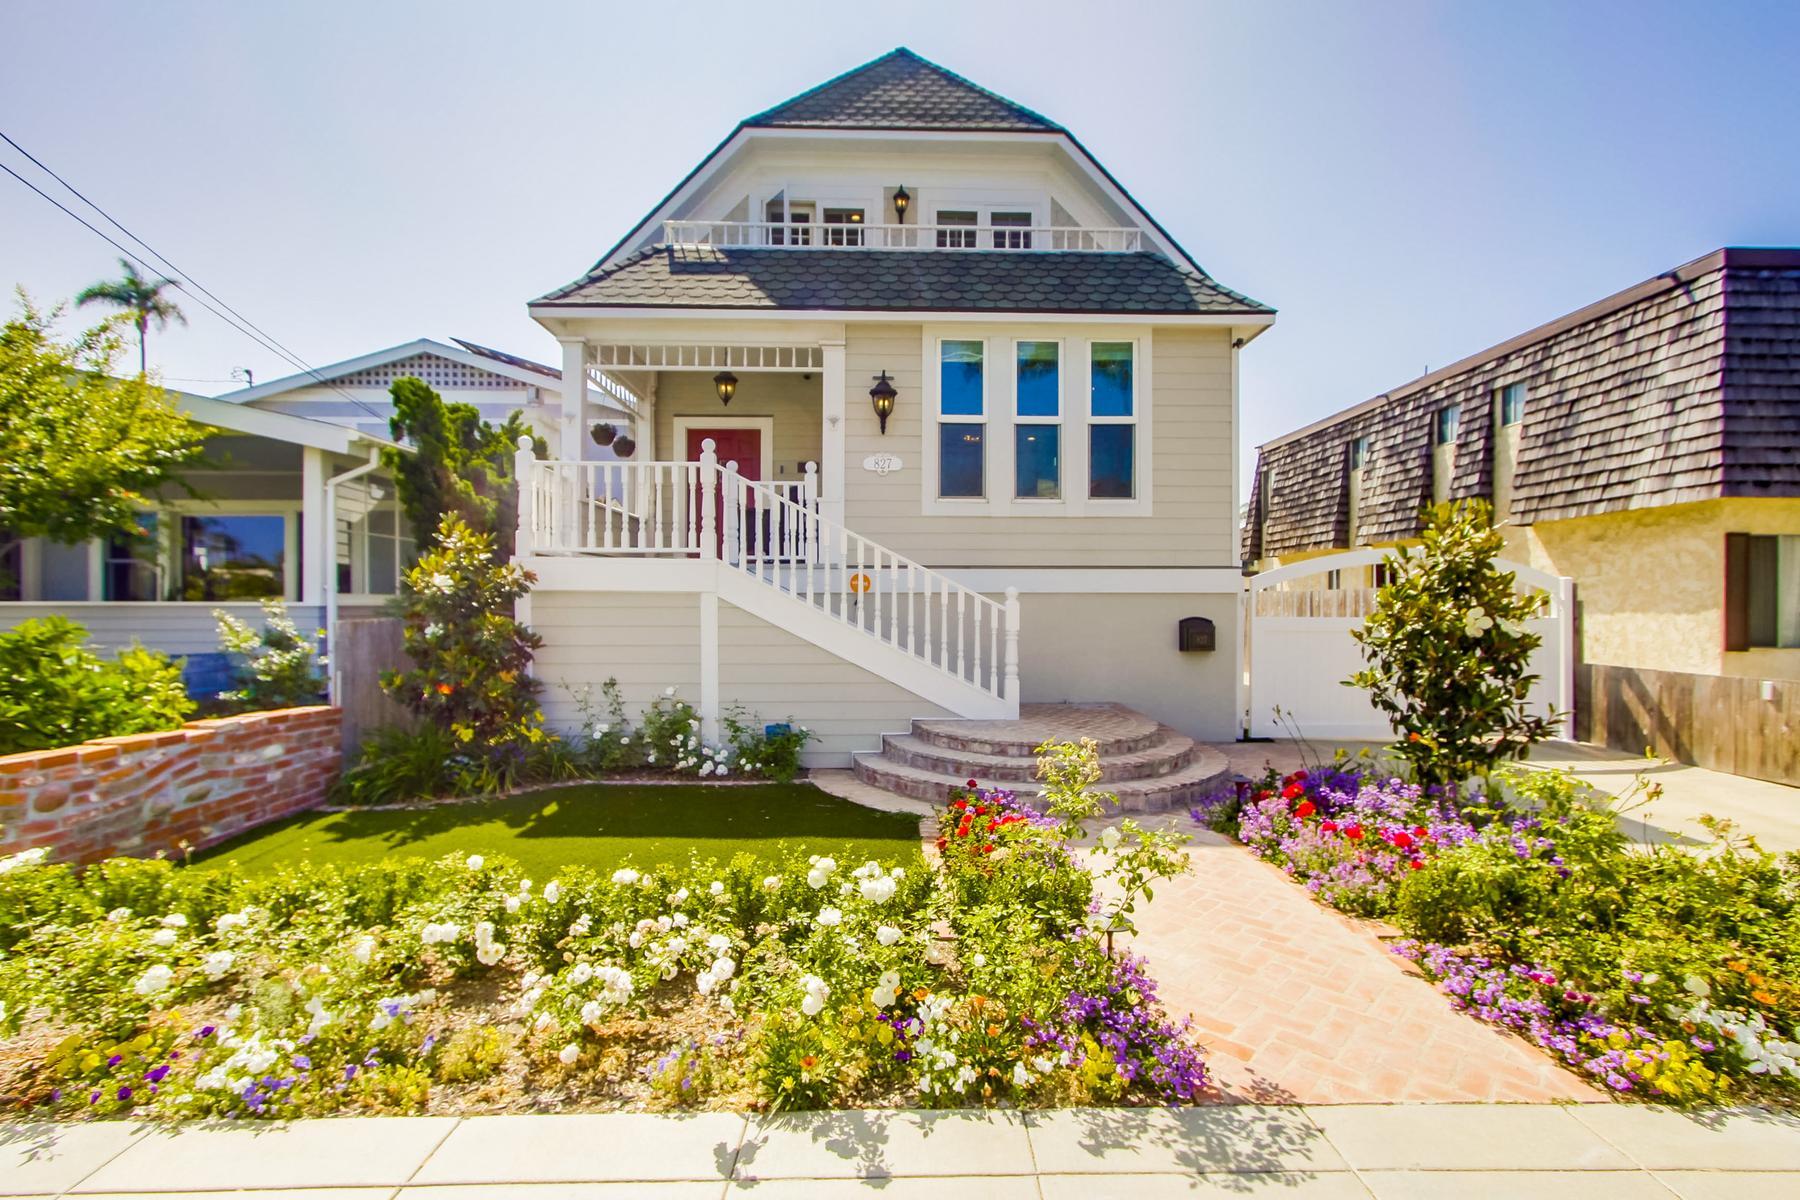 Single Family Homes for Sale at 827-829 A Ave Coronado, California 92118 United States